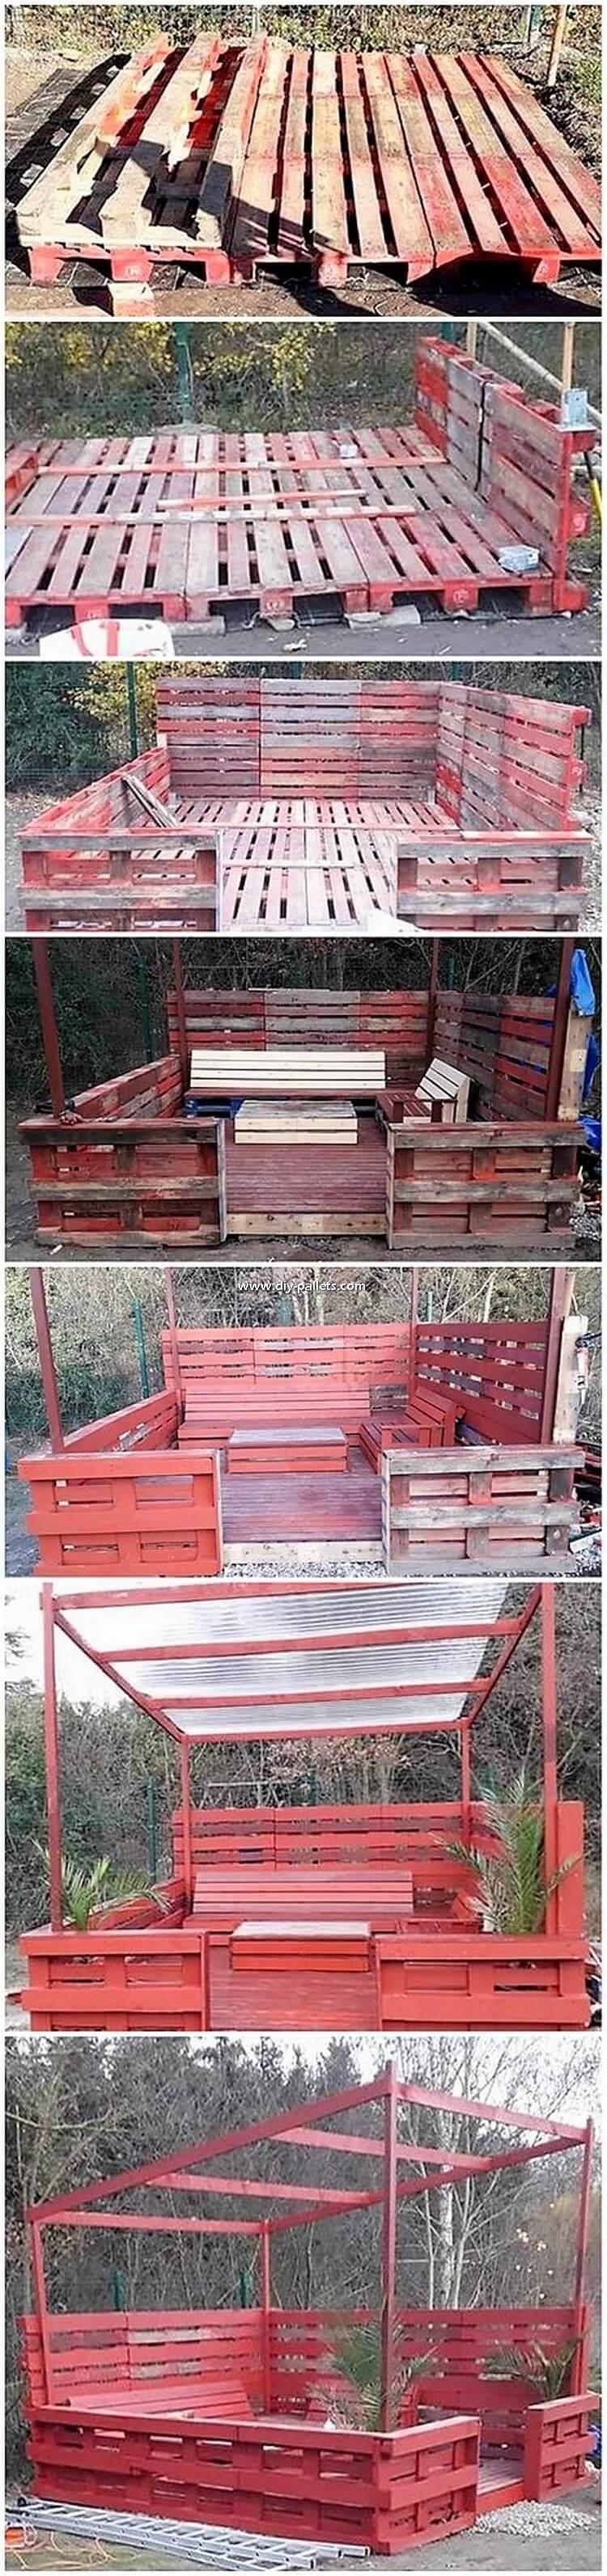 DIY Pallet Garden Terrace with Furniture